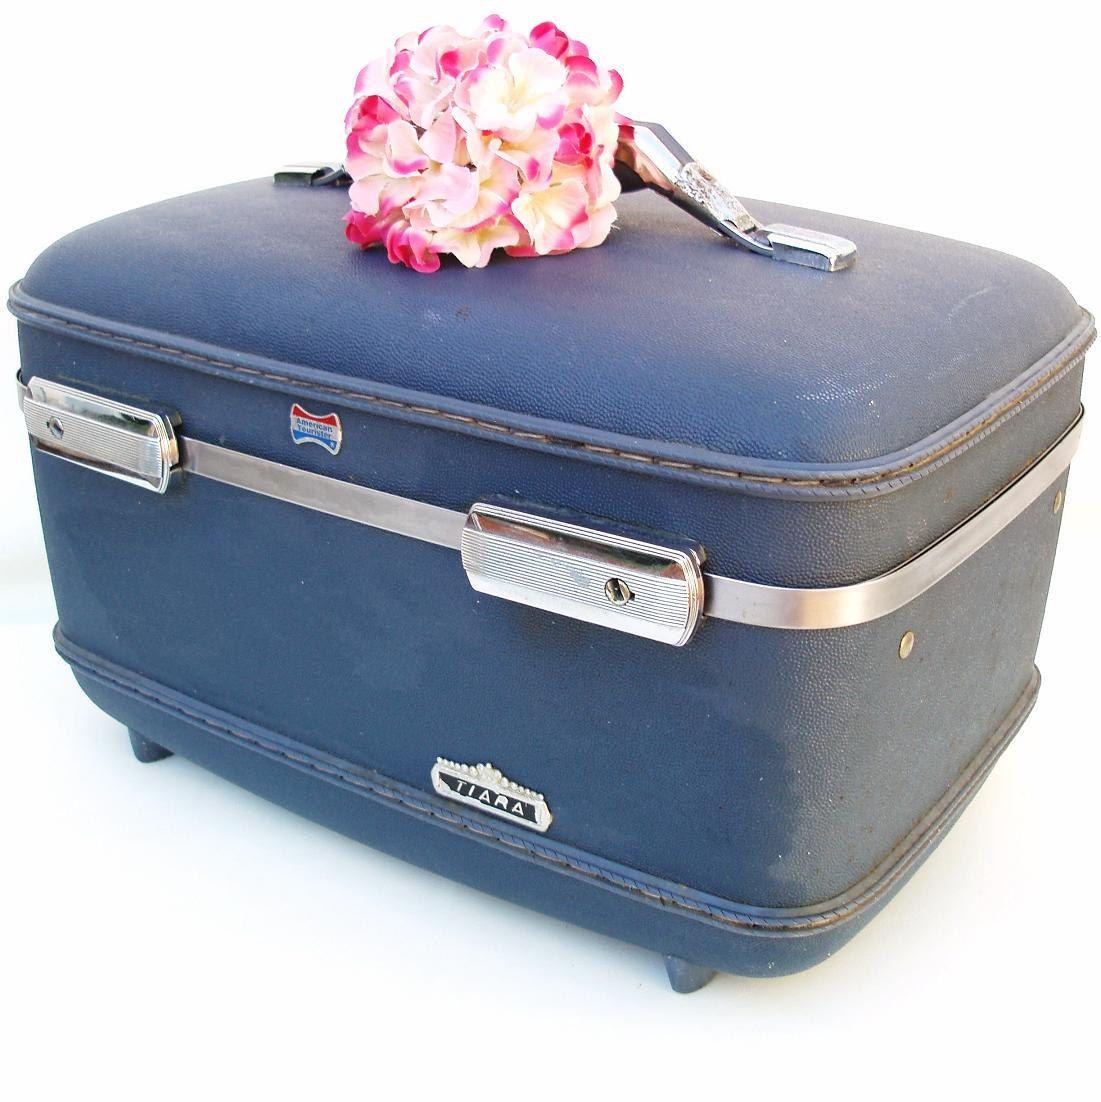 1960s American Tourister Train Case Tiara Blue Makeup Bag